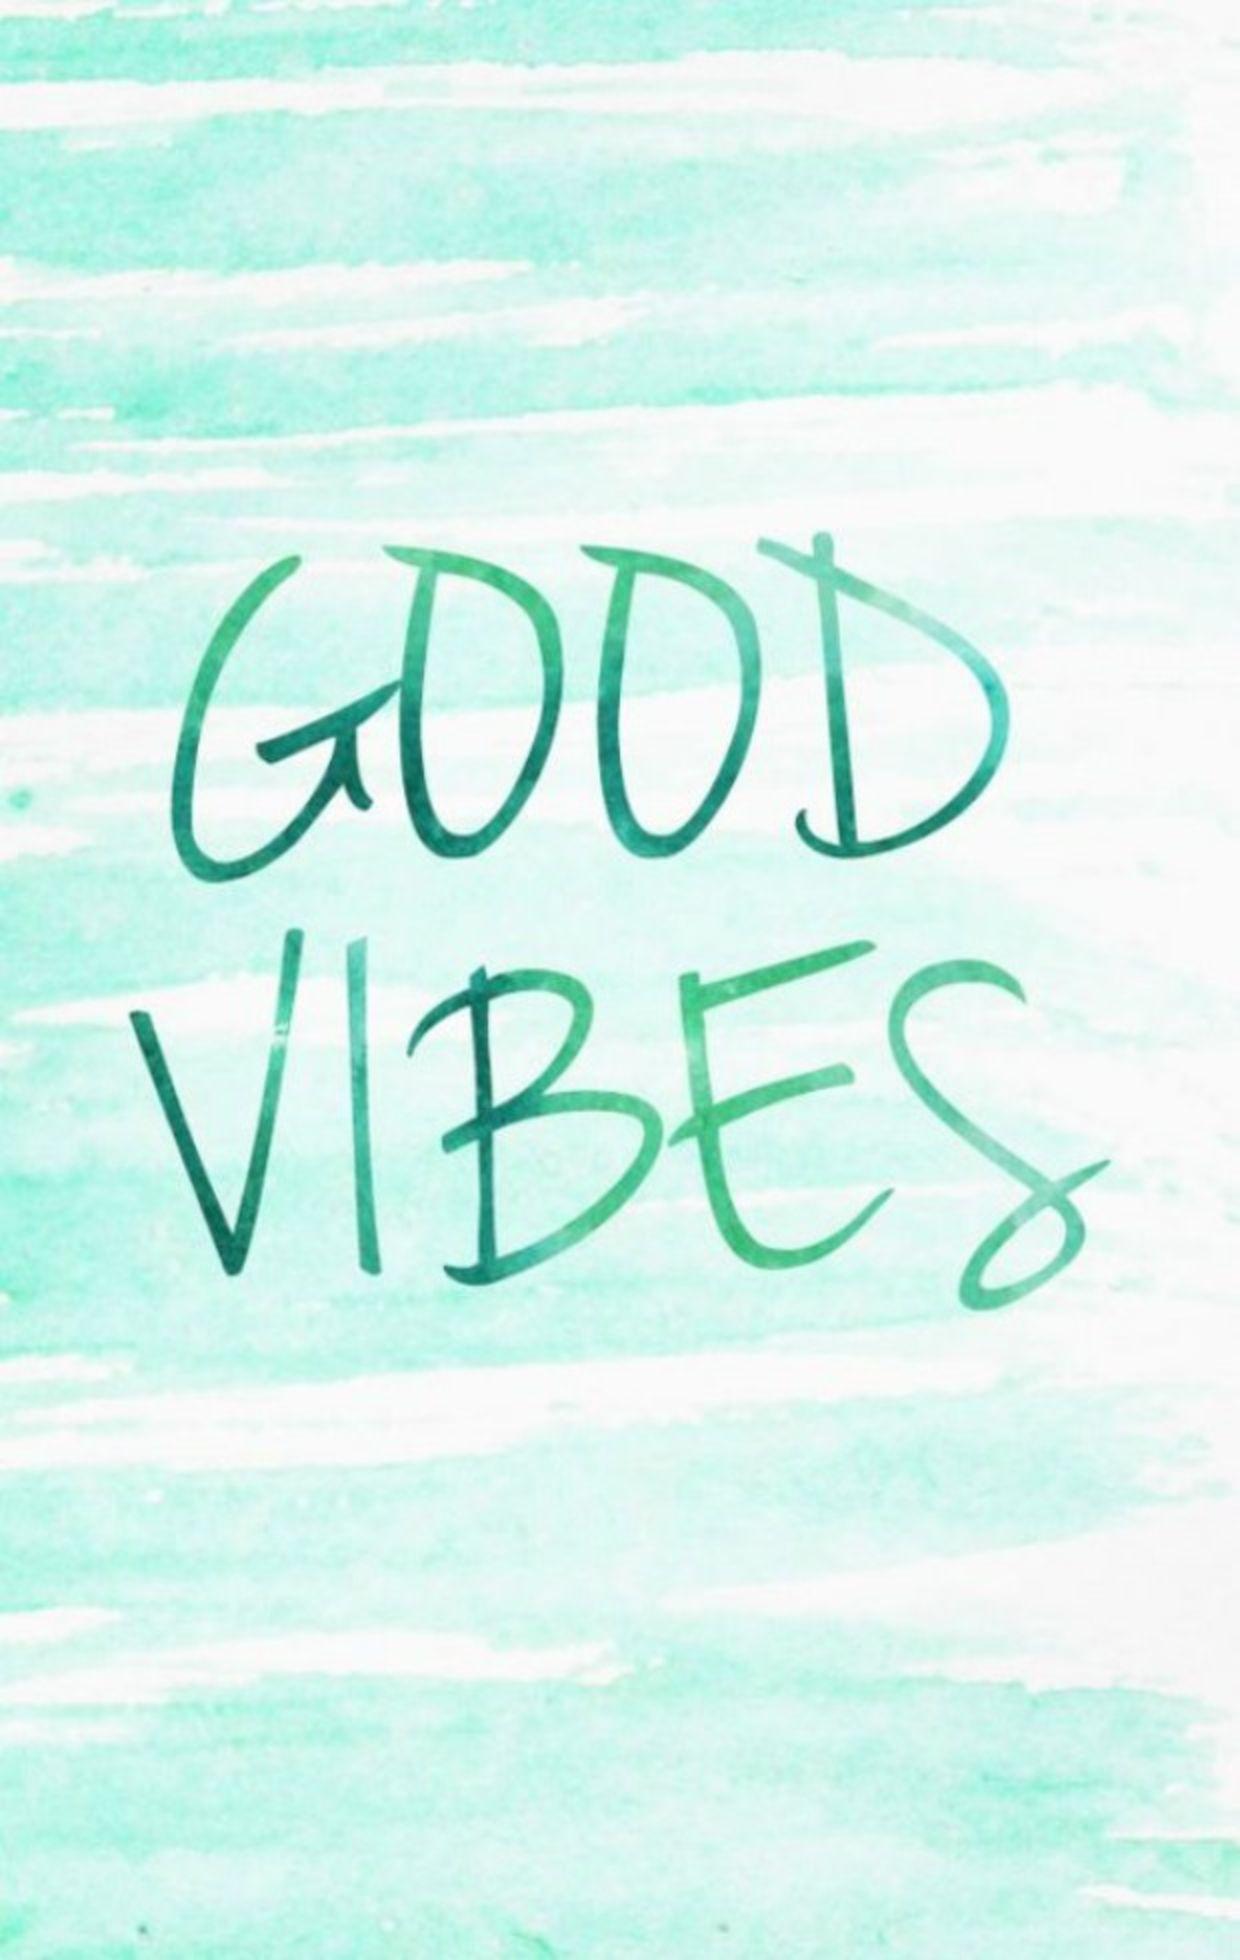 good vibes mobile wallpaper Backgrounds Pinterest